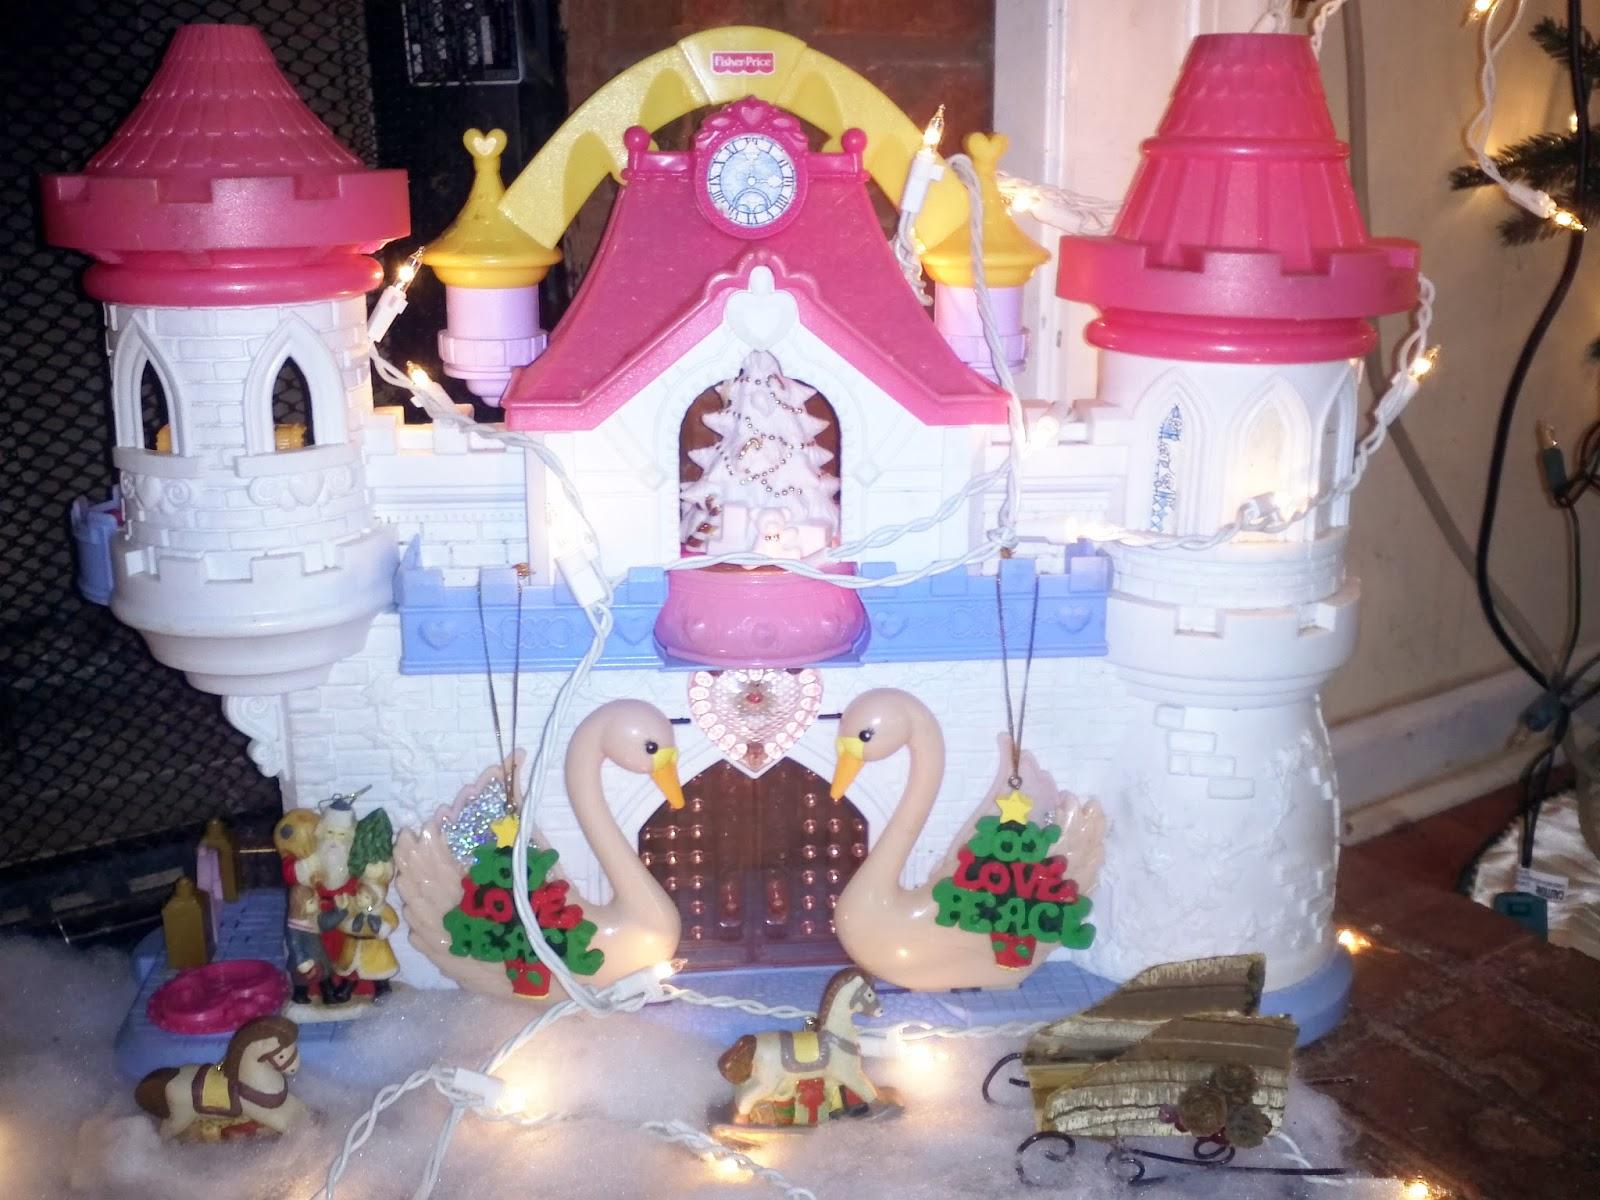 Fisher price princesses castle